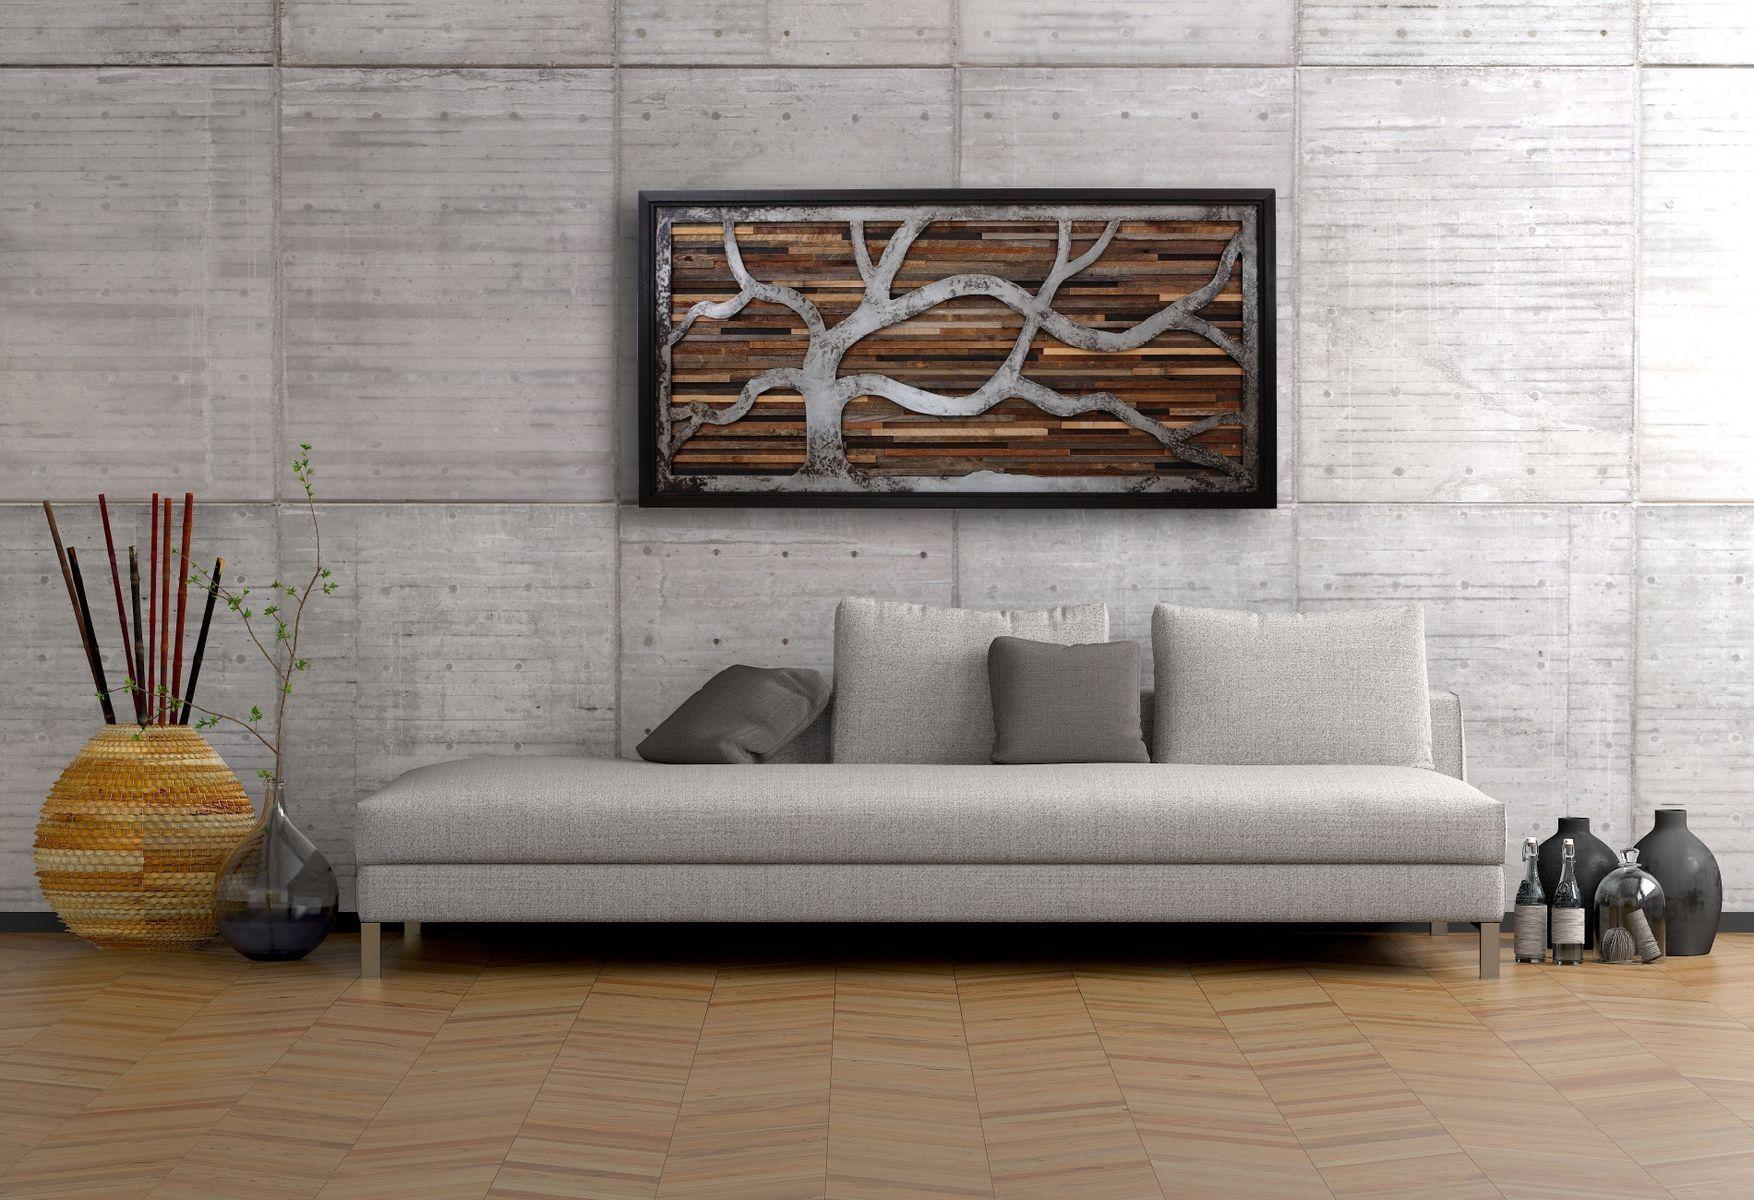 Wall Art Design Ideas: Vertically Artwork Wall Art Made Of Wood Pertaining To Natural Wood Wall Art (Image 13 of 20)